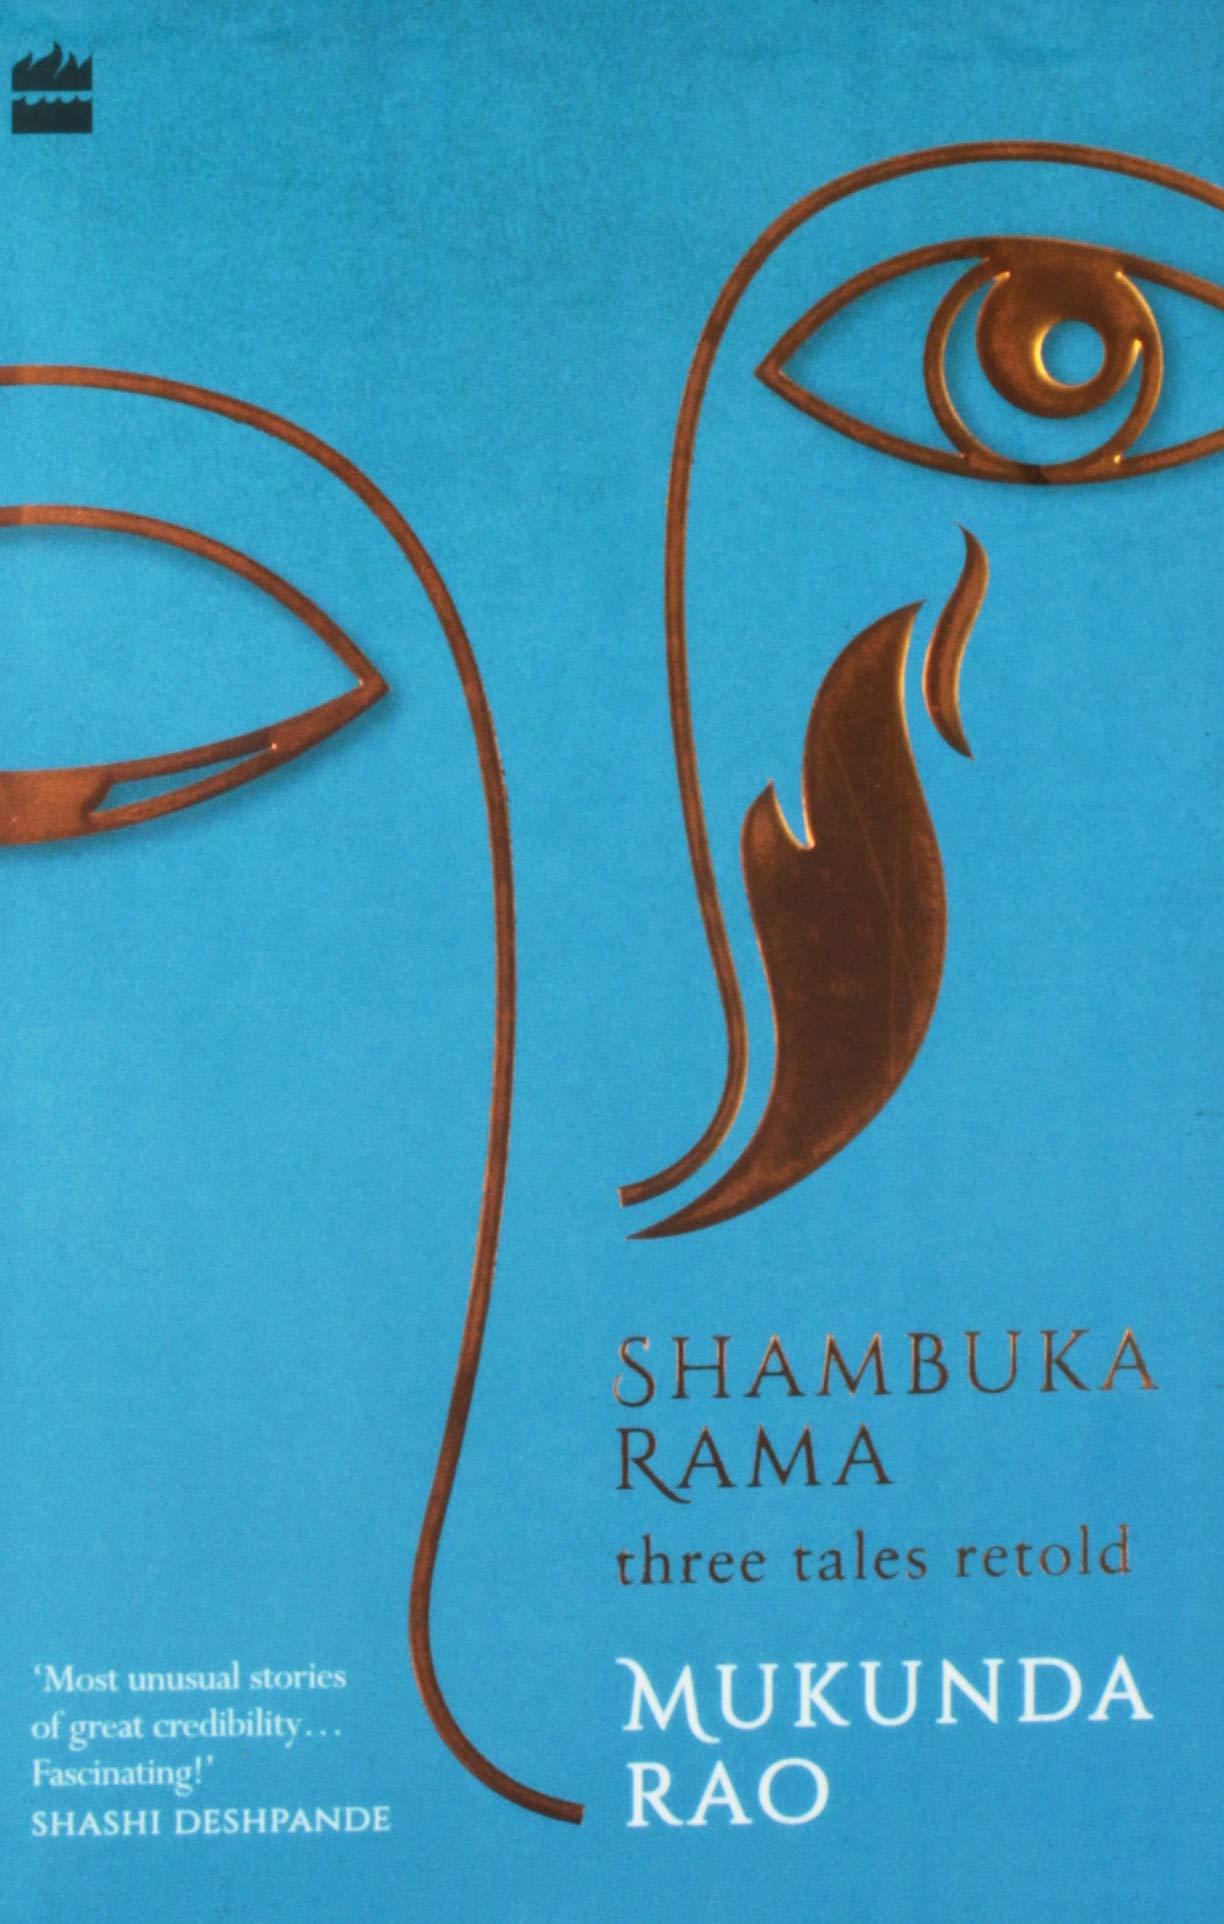 Shambuka Rama - Three Tales Retold by Mukunda Rao